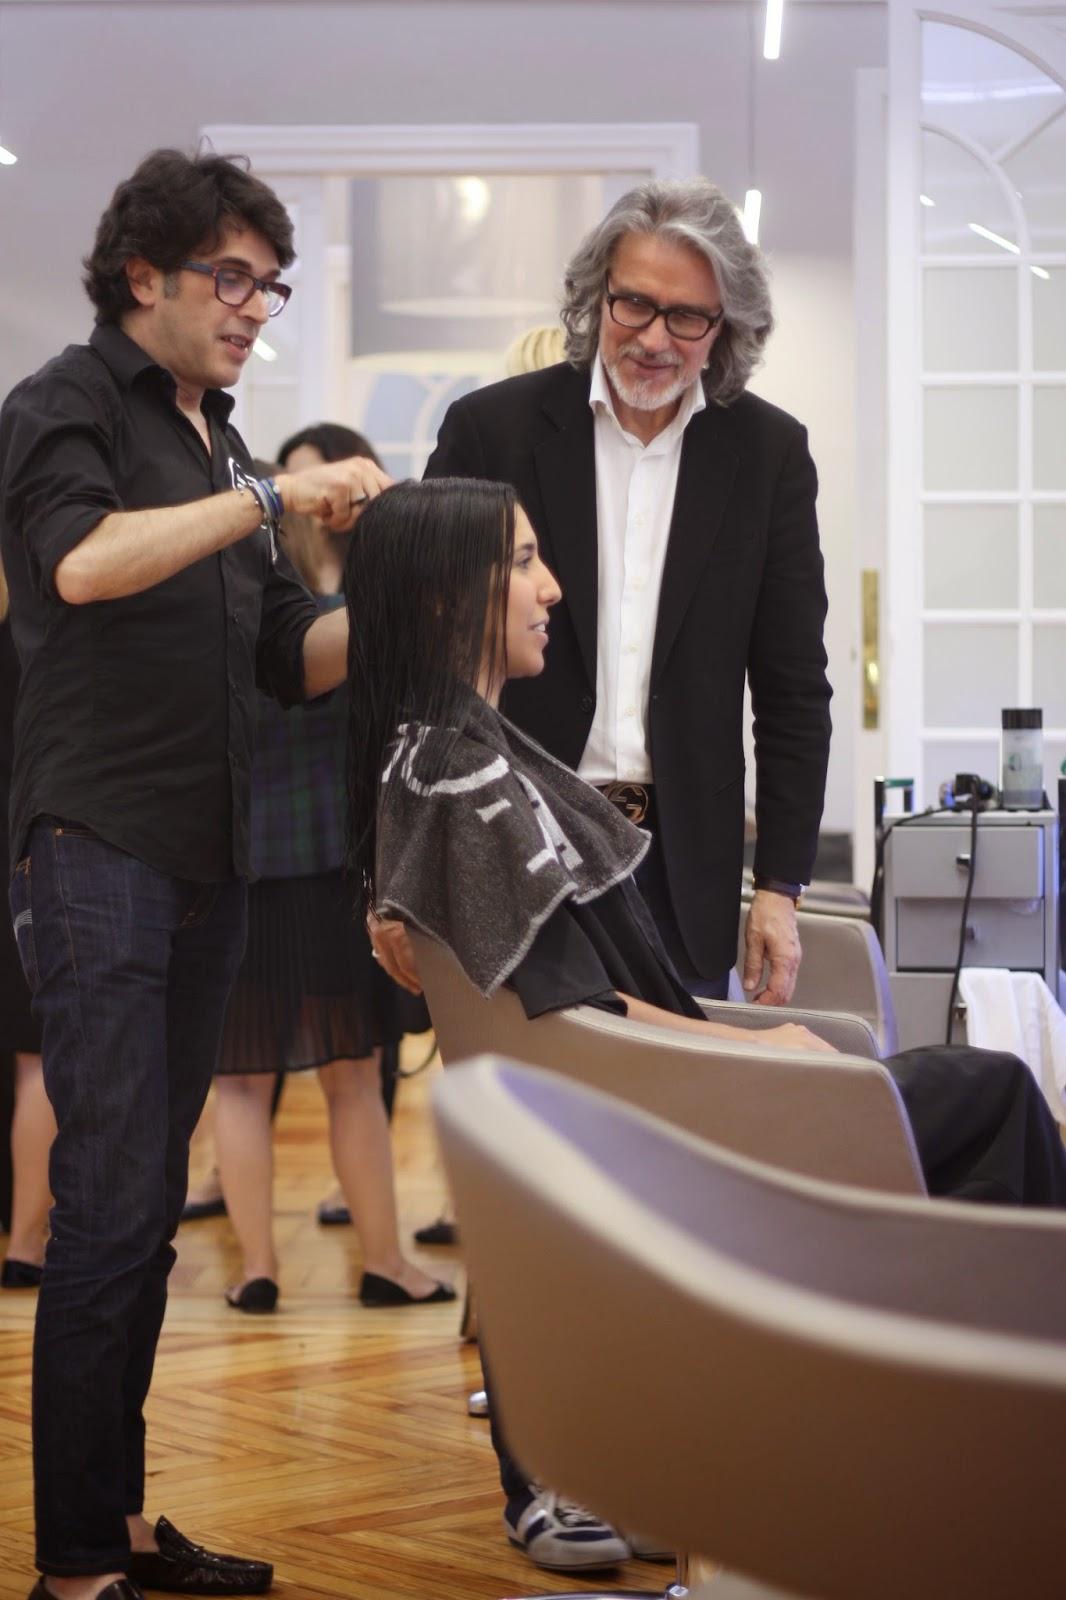 Alberto cerdan cortes de pelo